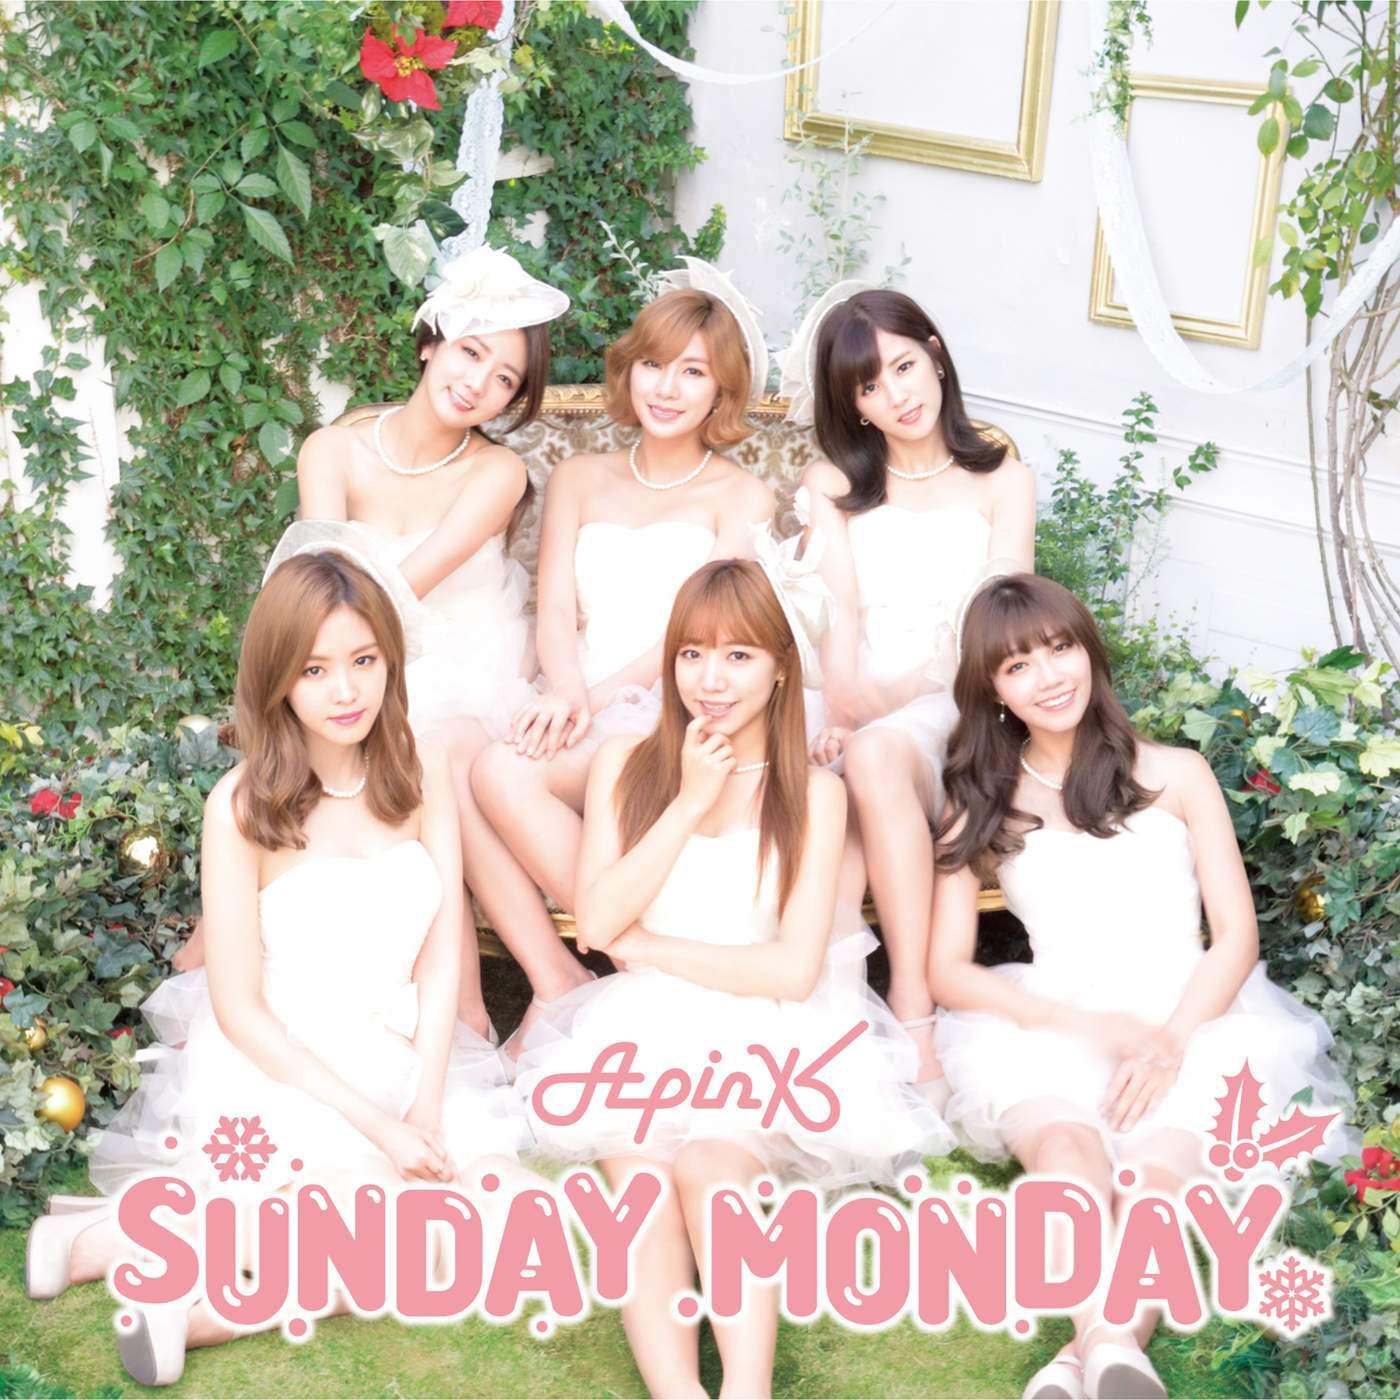 Apink – Sunday Monday (Japanese Version) K2Ost free mp3 download korean song kpop kdrama ost lyric 320 kbps